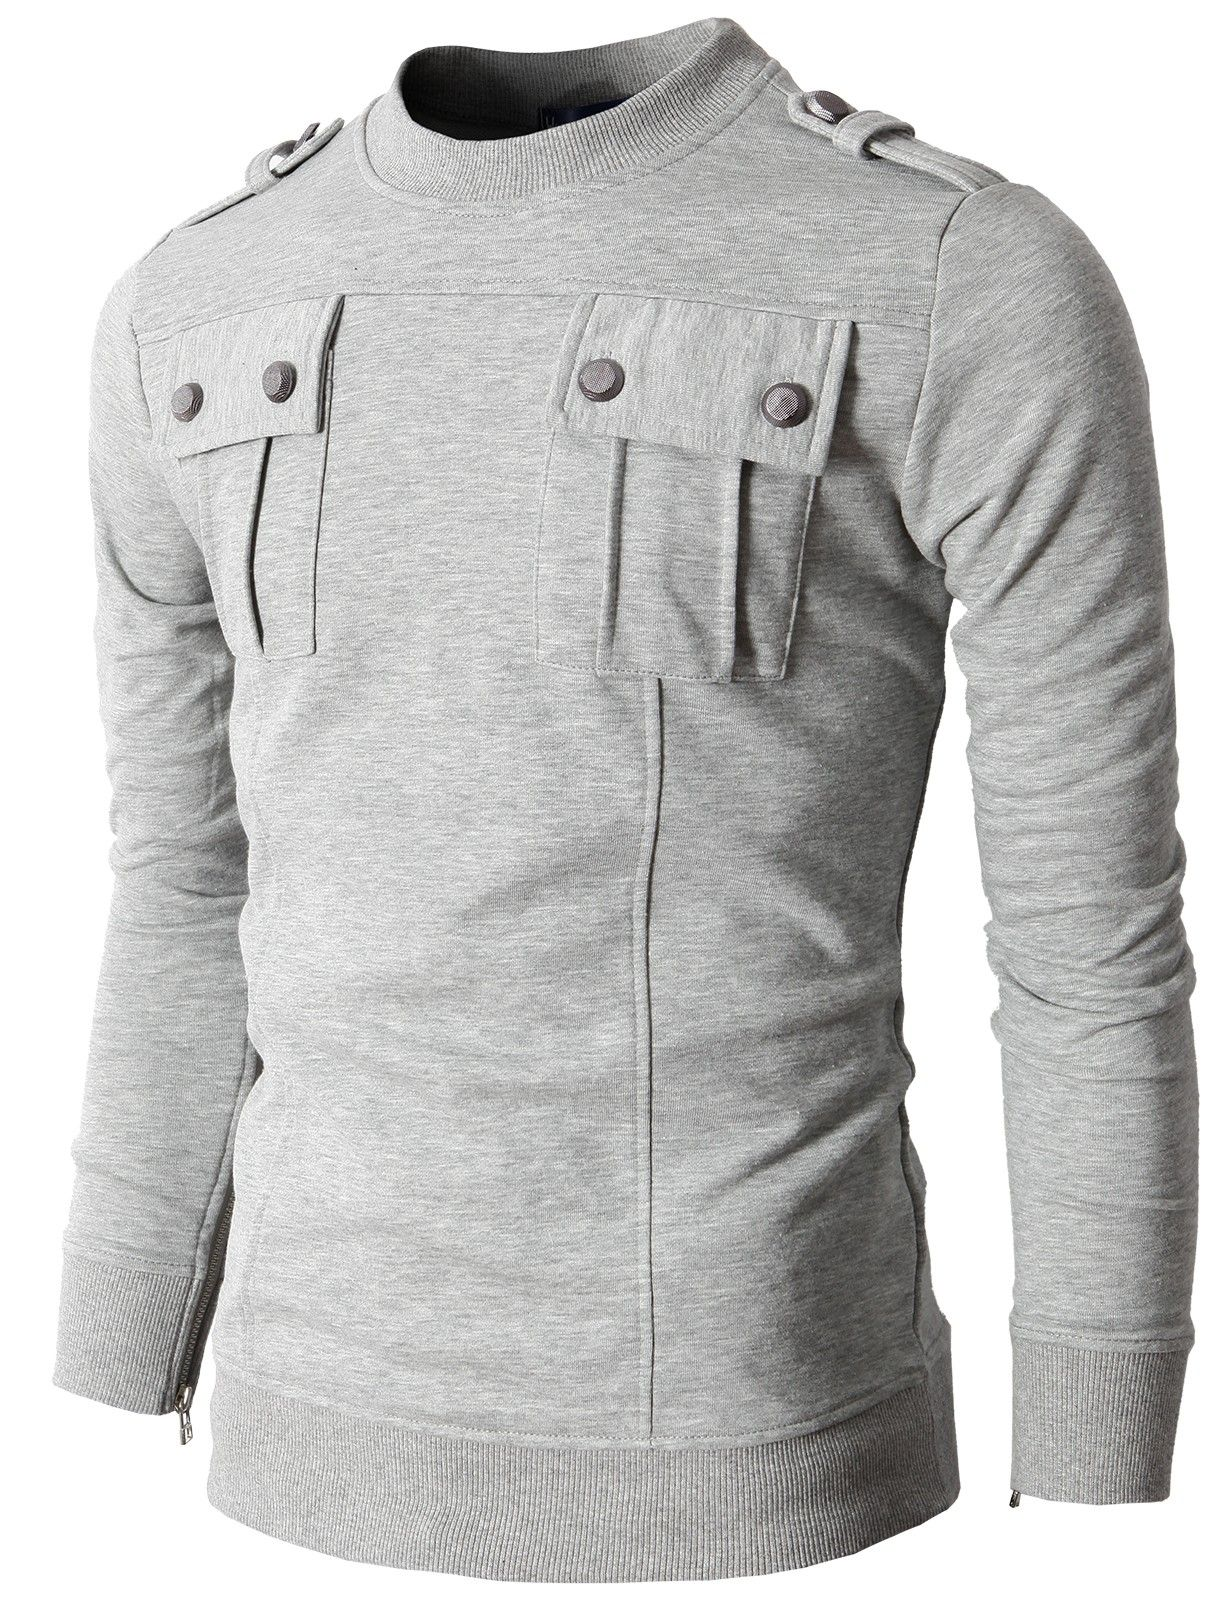 1980e272d27 Mens T-shirts with Two Pocket and Shoulder Epaulet (KMTTL017 DOUBLJU ...